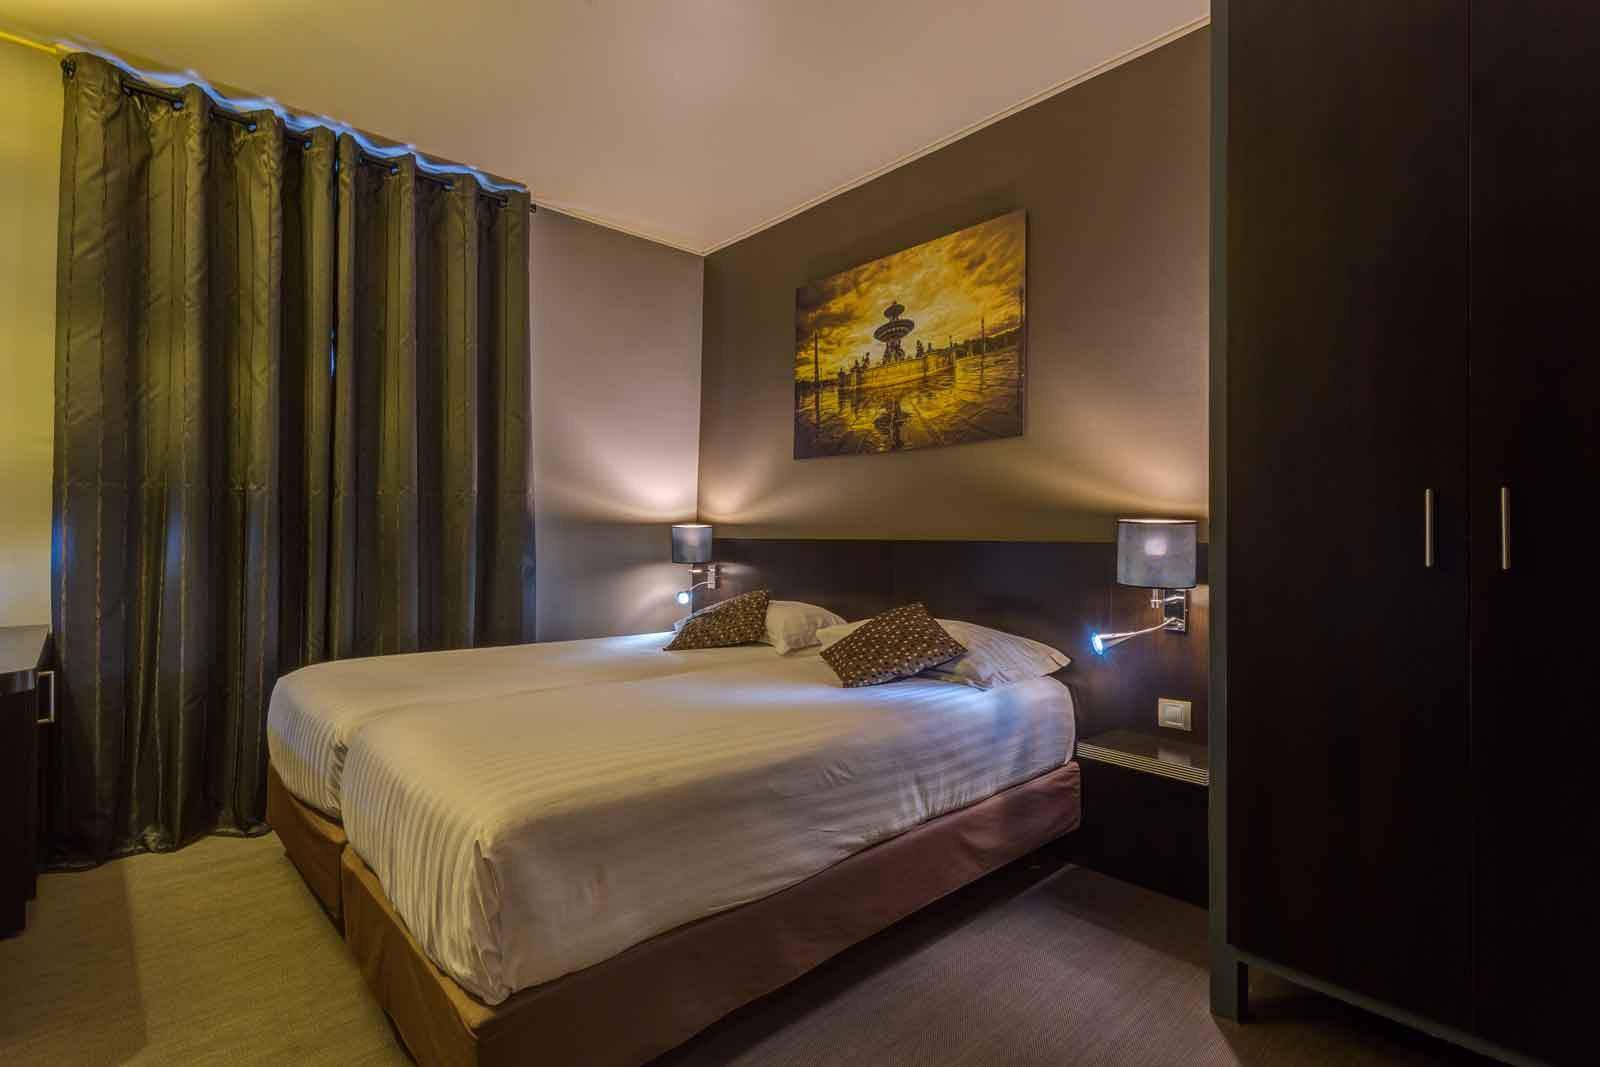 Chambre twin a 2 lits hotel jardin de villiers paris 17 for Chambre twin